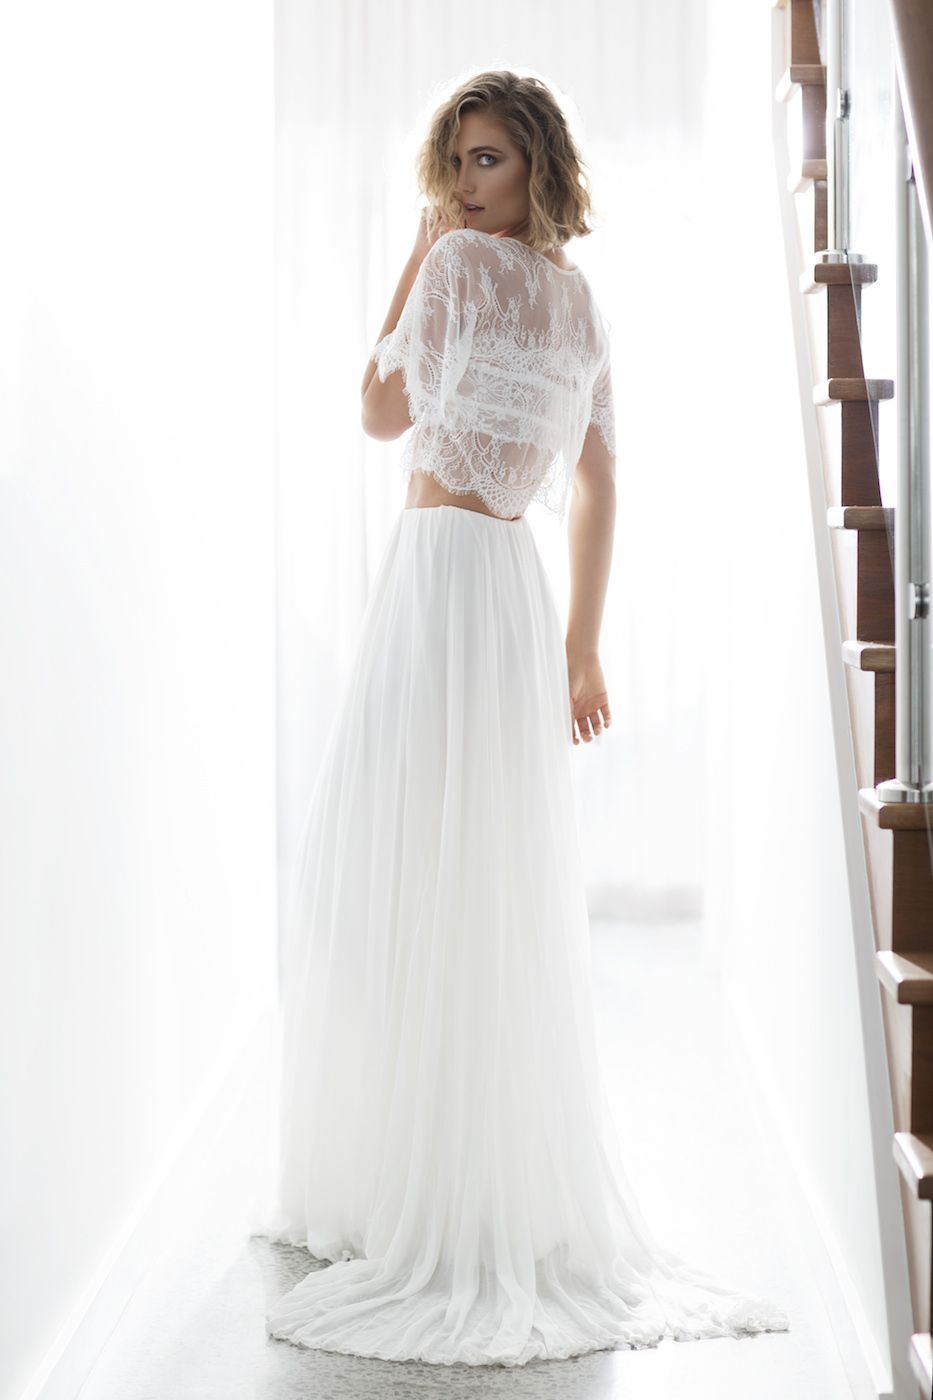 Backlit say yes grace loves lace wedding wedding dresses